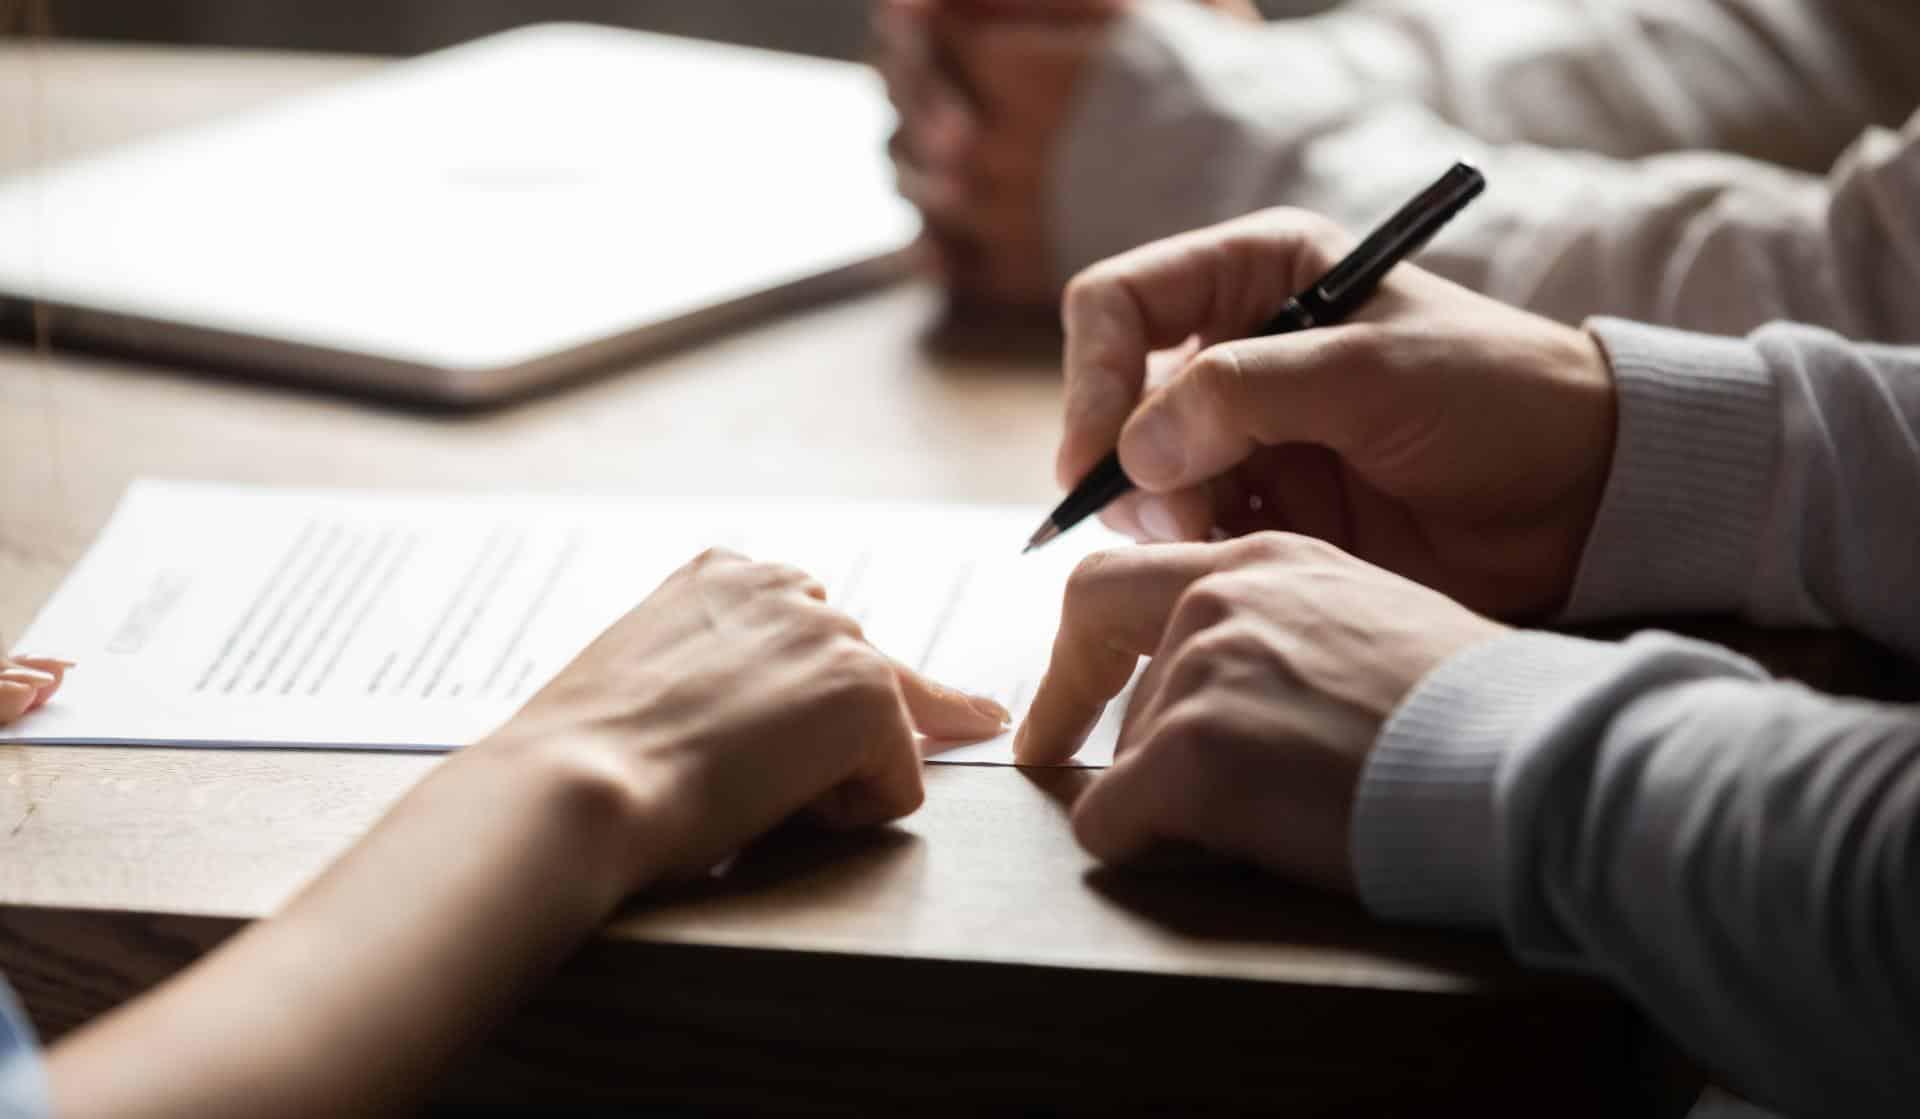 Kabinett beschließt EnWG-Novelle - umstrittener Paragraf 14a gestrichen